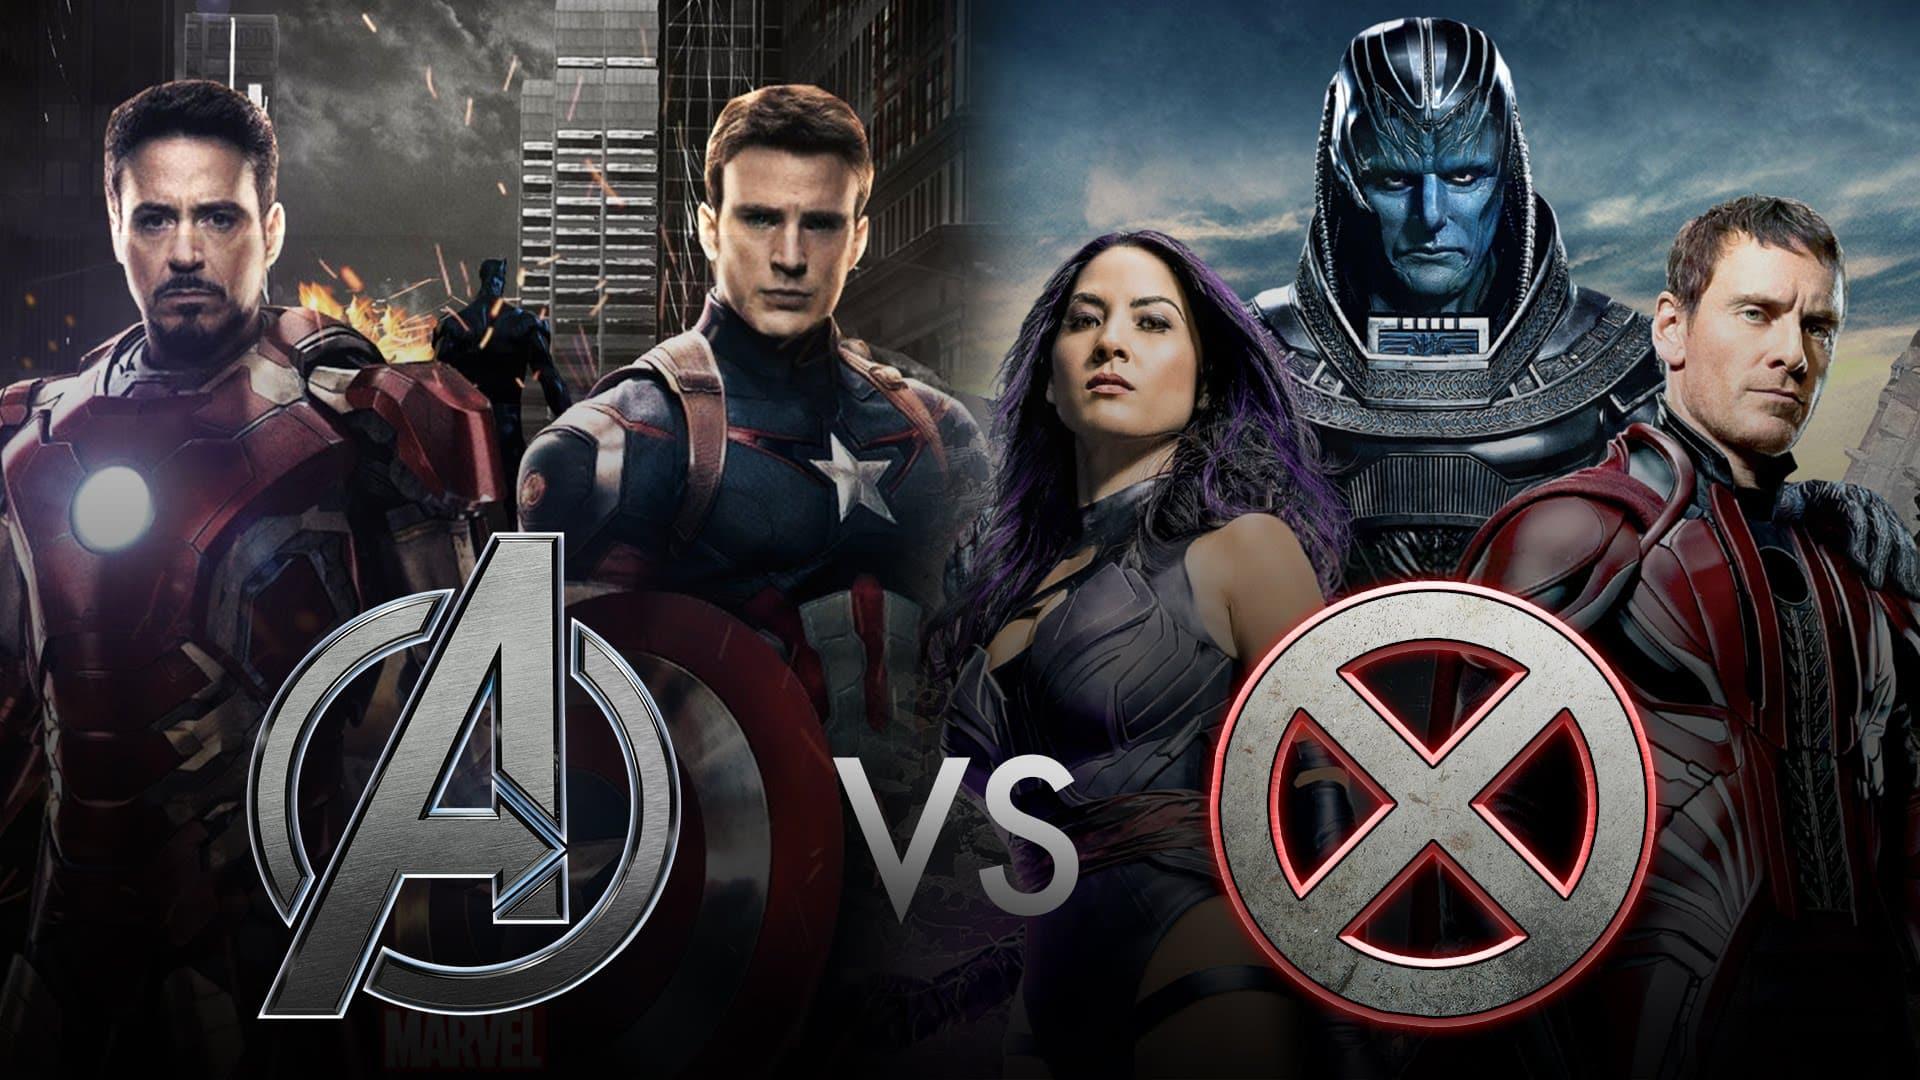 Imagenes De Xmen: New Fan Trailer For X-Men Vs. Avengers Released